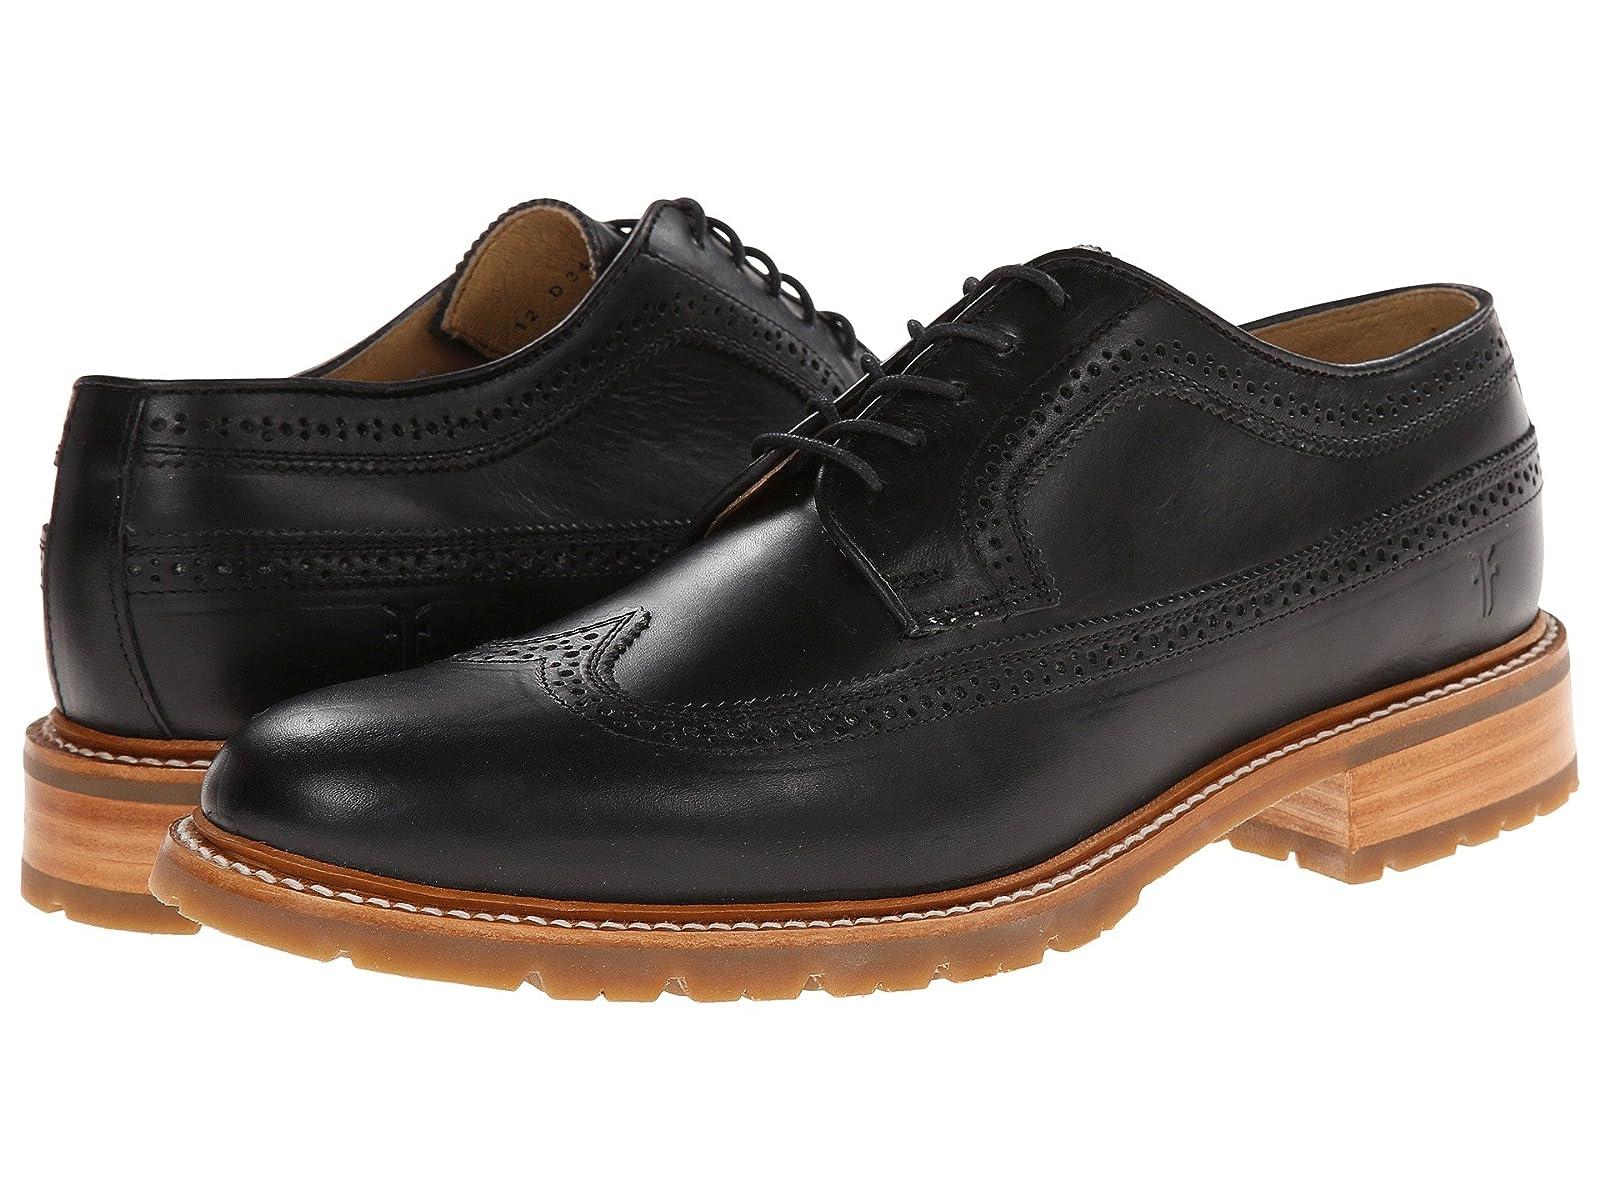 Frye James Lug WingtipCheap and distinctive eye-catching shoes